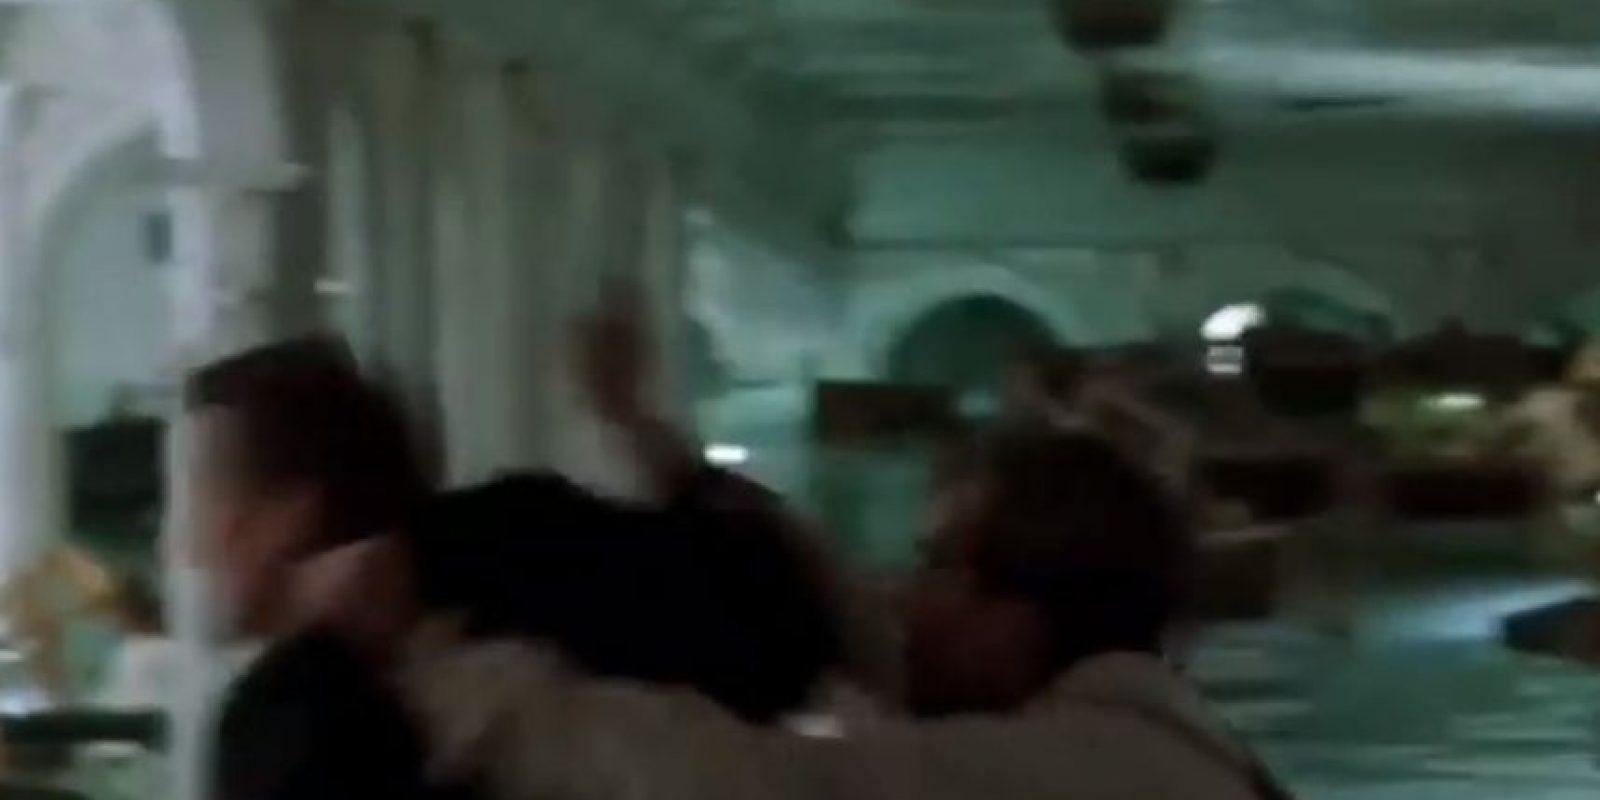 Al final, Jack golpea severamente a Lovejoy Foto:Fox